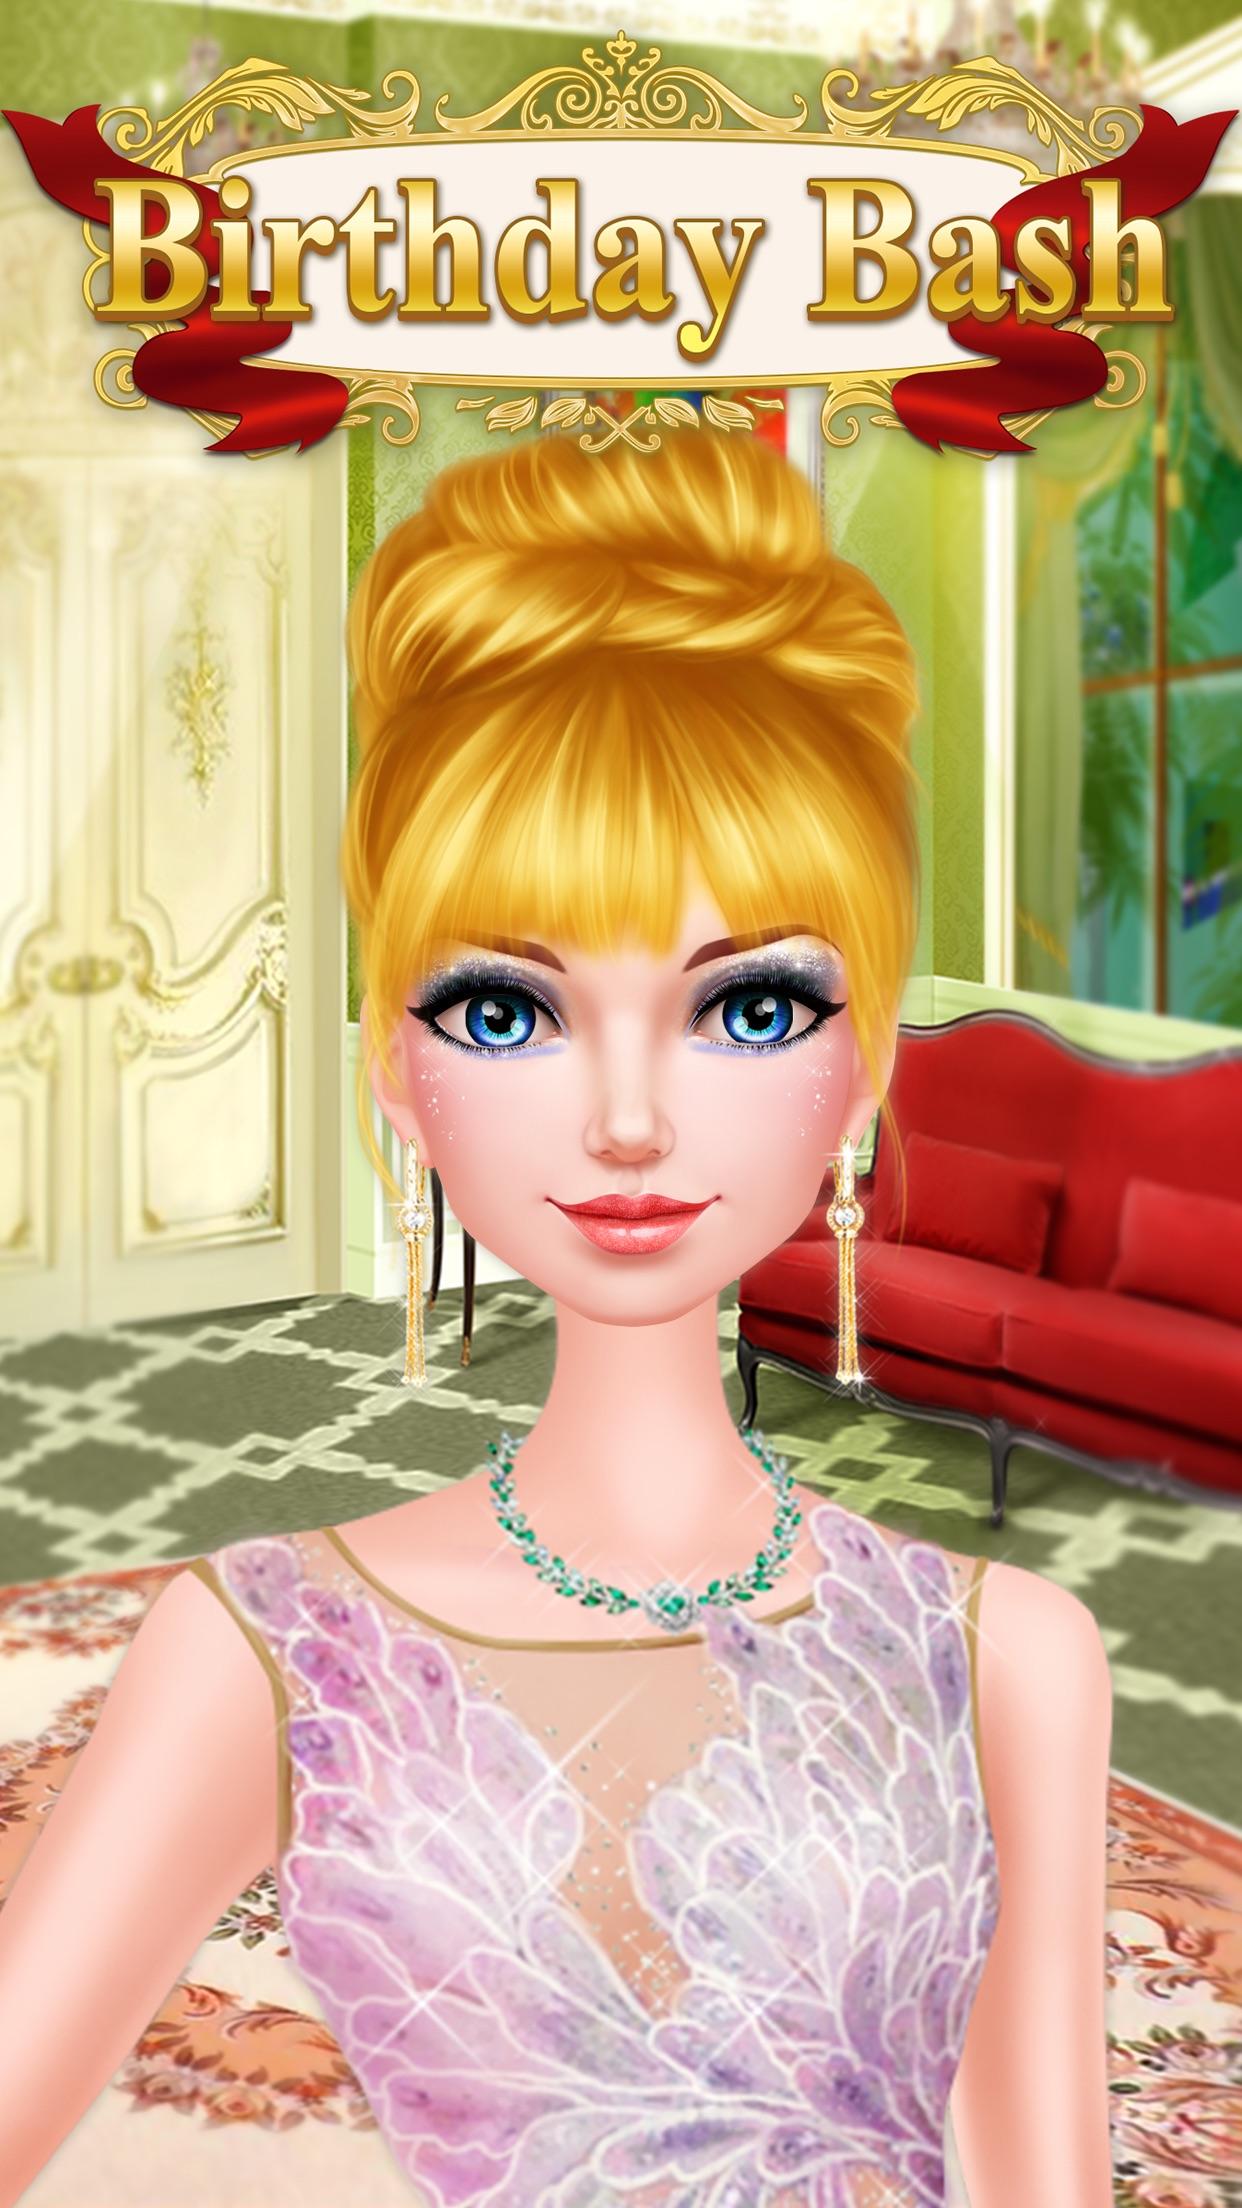 Princess Birthday Bash Makeover Royal Beauty Salon Screenshot